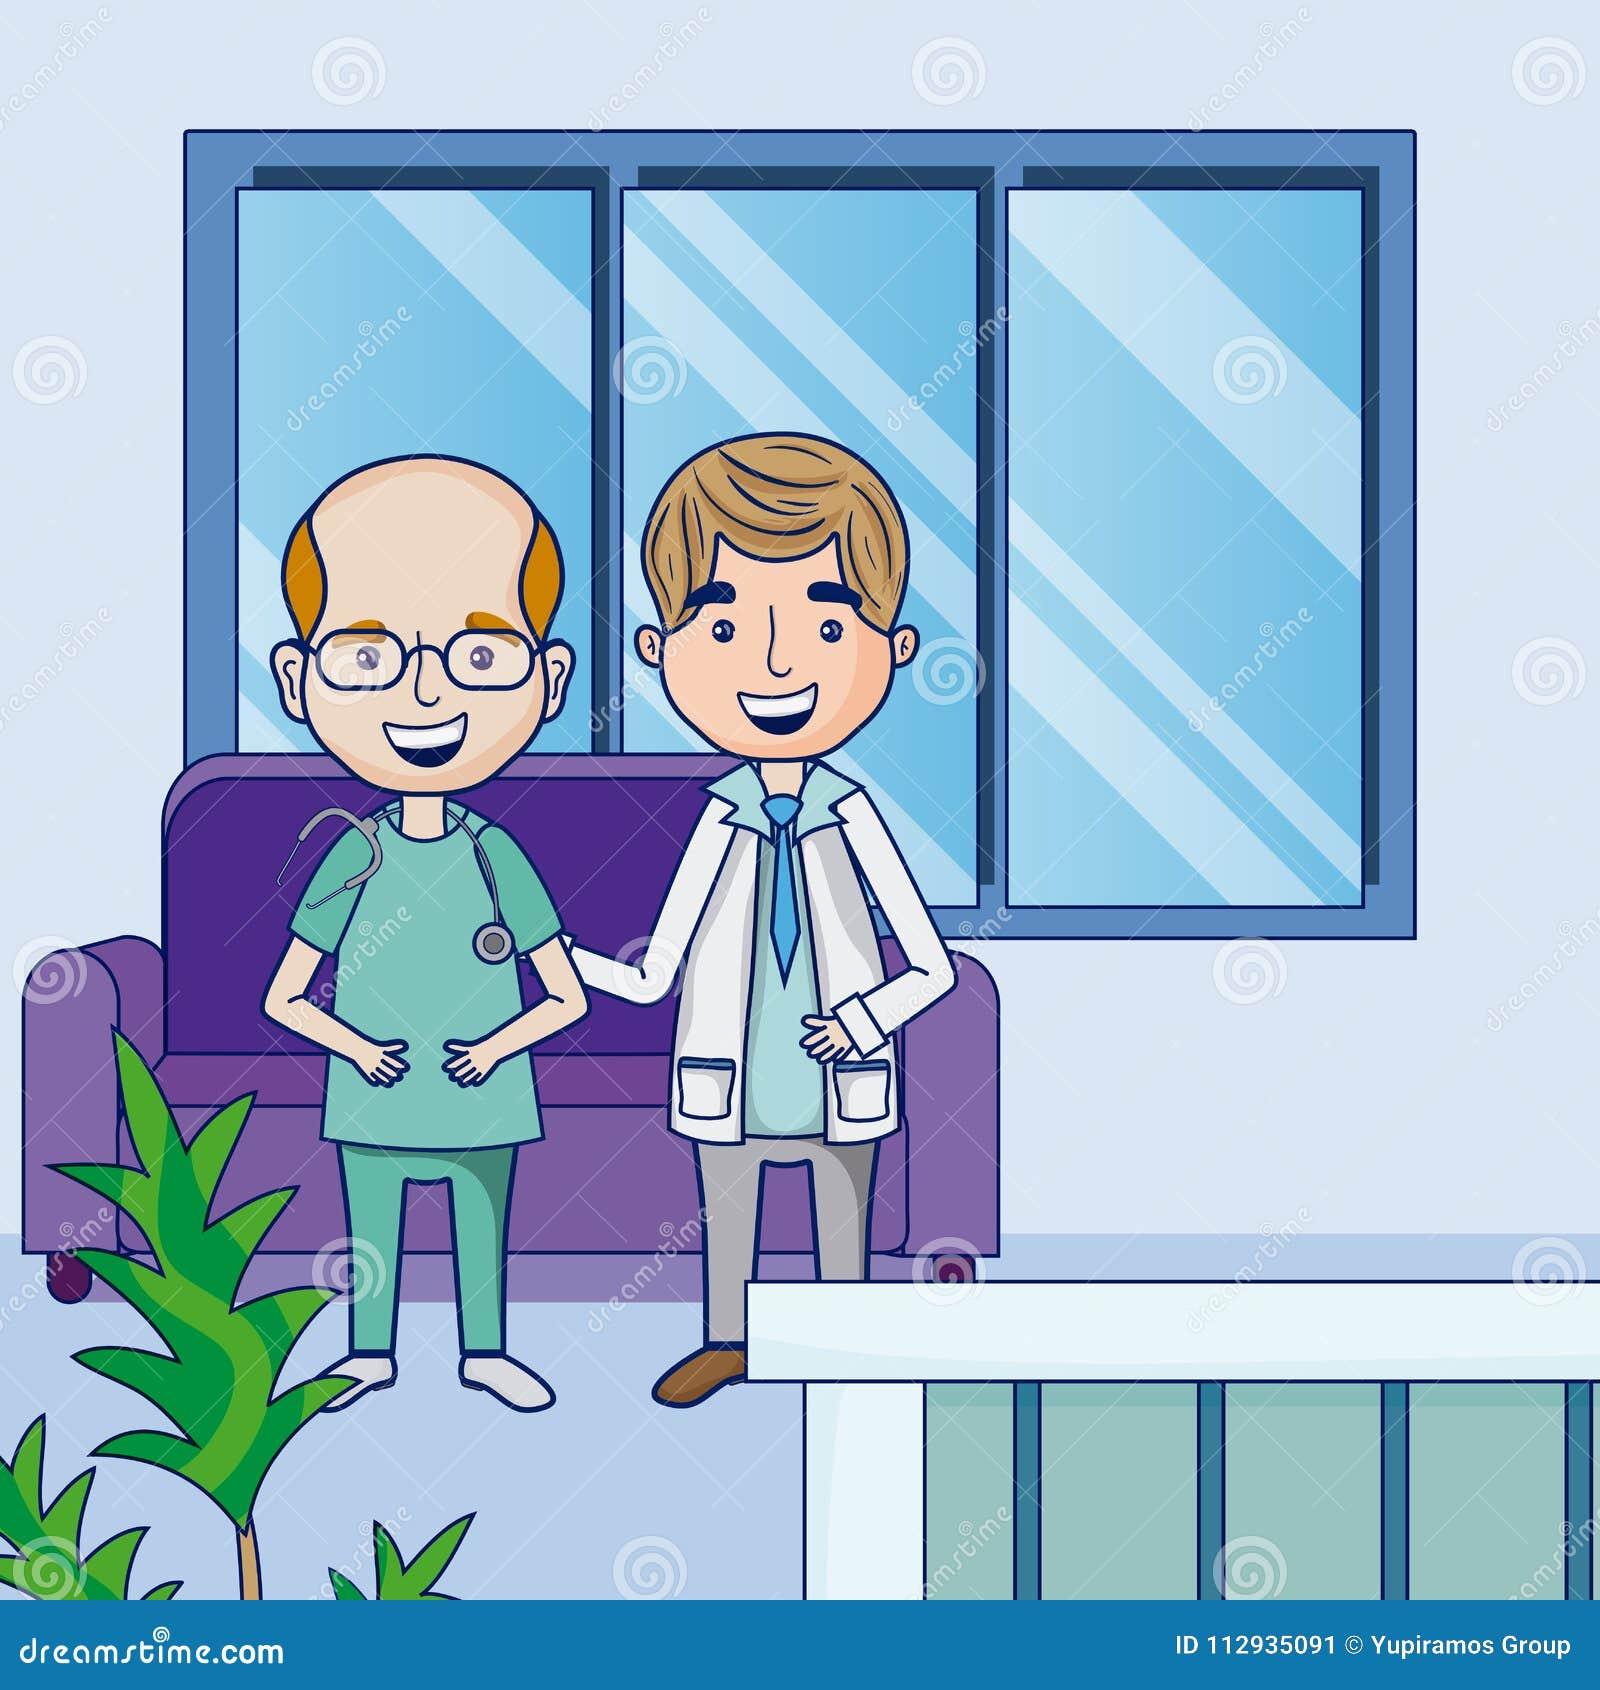 Funny Cartoon Hospital Pics funny doctors cartoons stock vector. illustration of humor